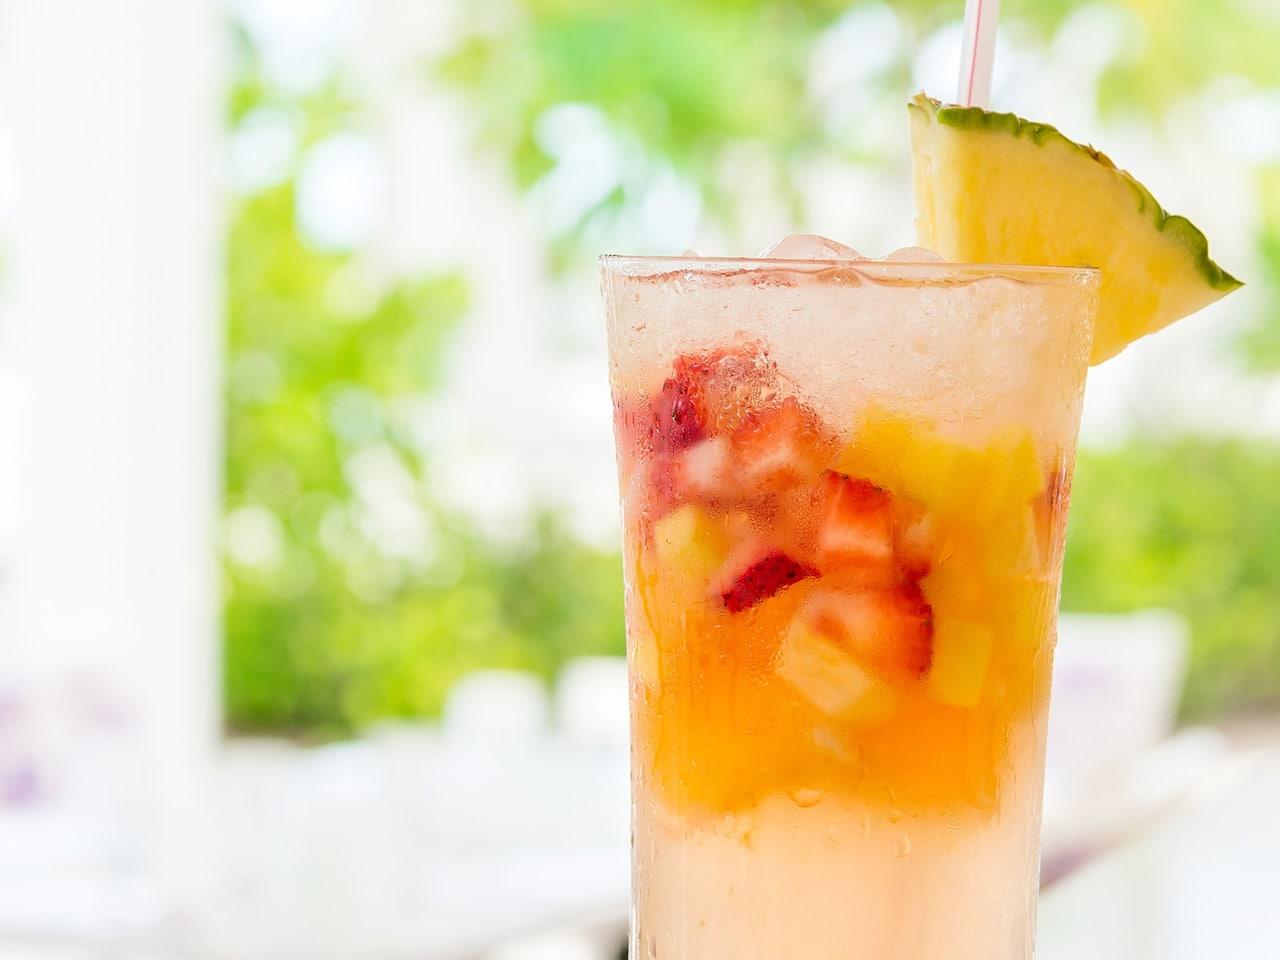 Palms Cafe Strawberry Mango Daiquiri